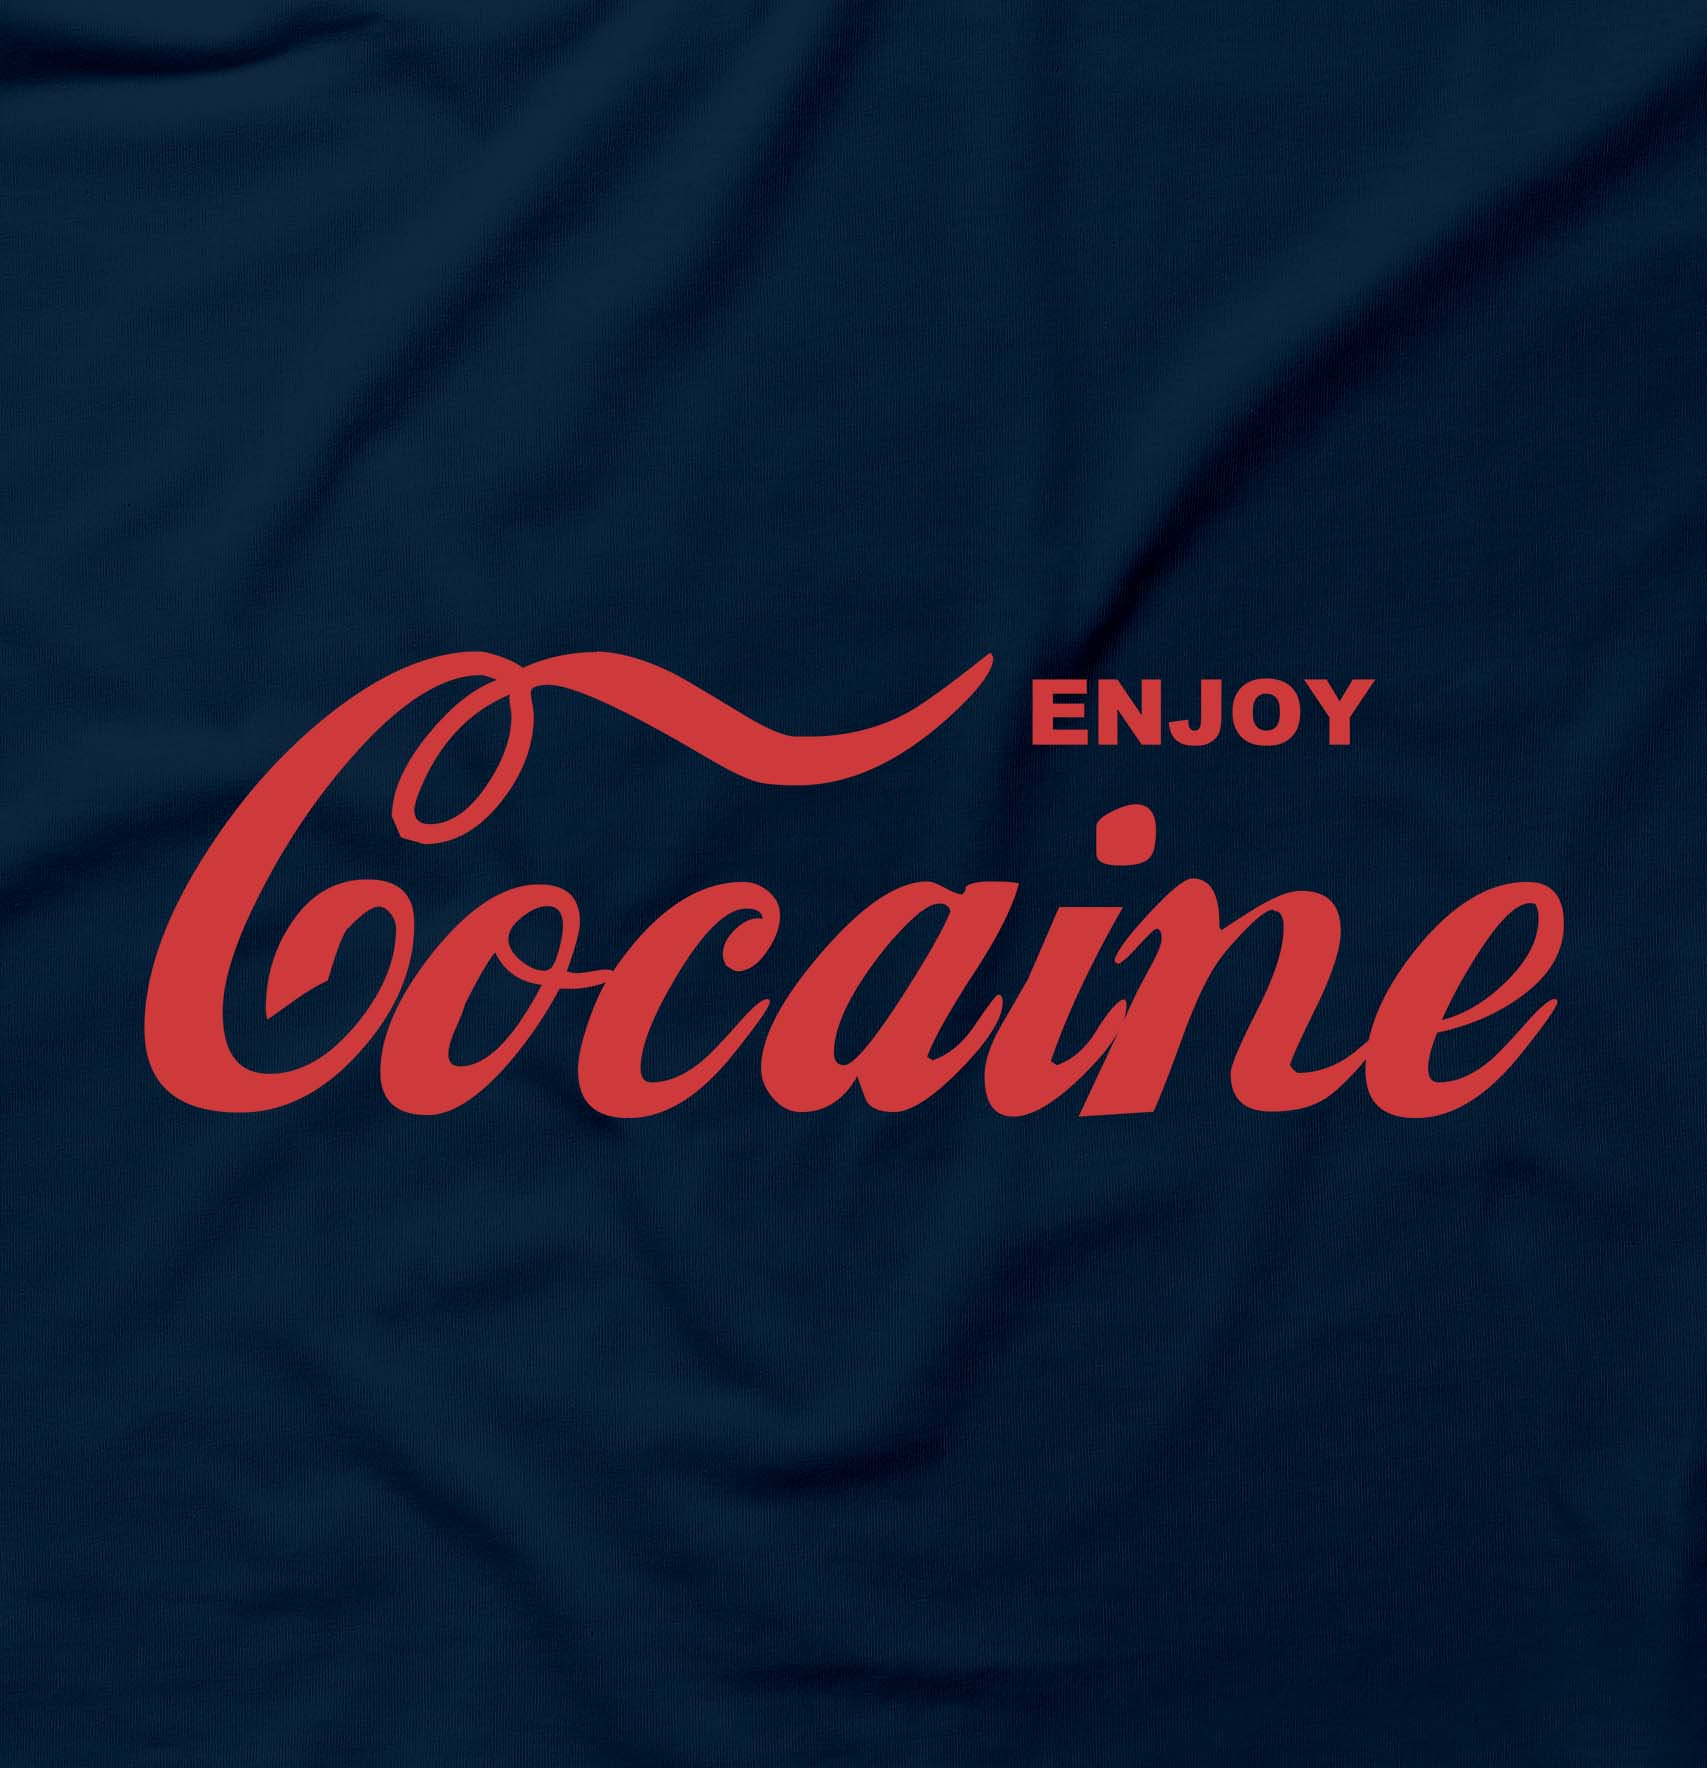 Enjoy Cocaine Cola  Funny Drug Retro Coke